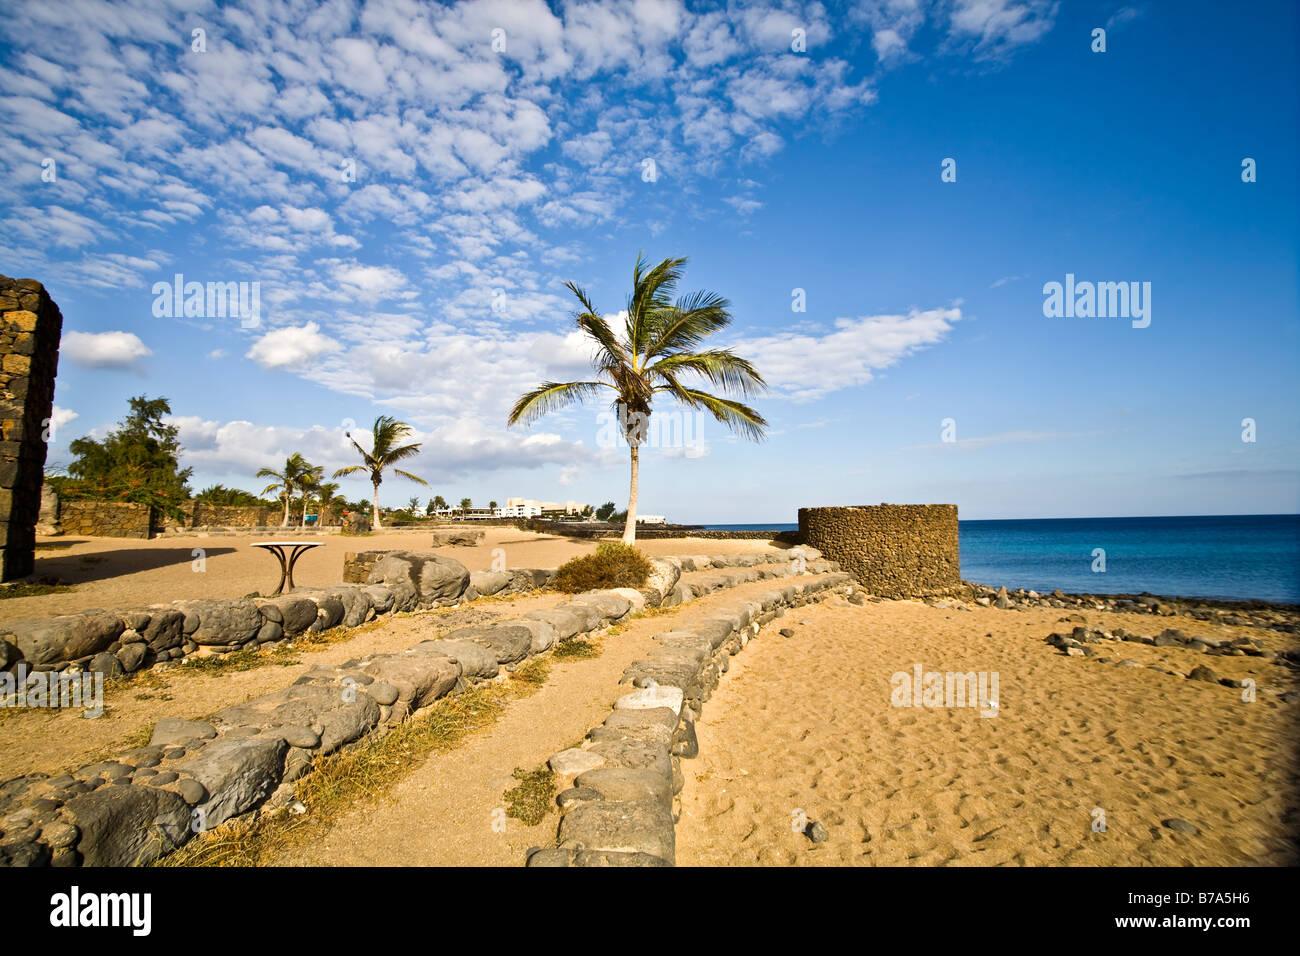 Playa bastian Costa Teguise Lanzarote Kanarische Inseln Spanien Europa Strand Playa Reise Tourismus Stockbild